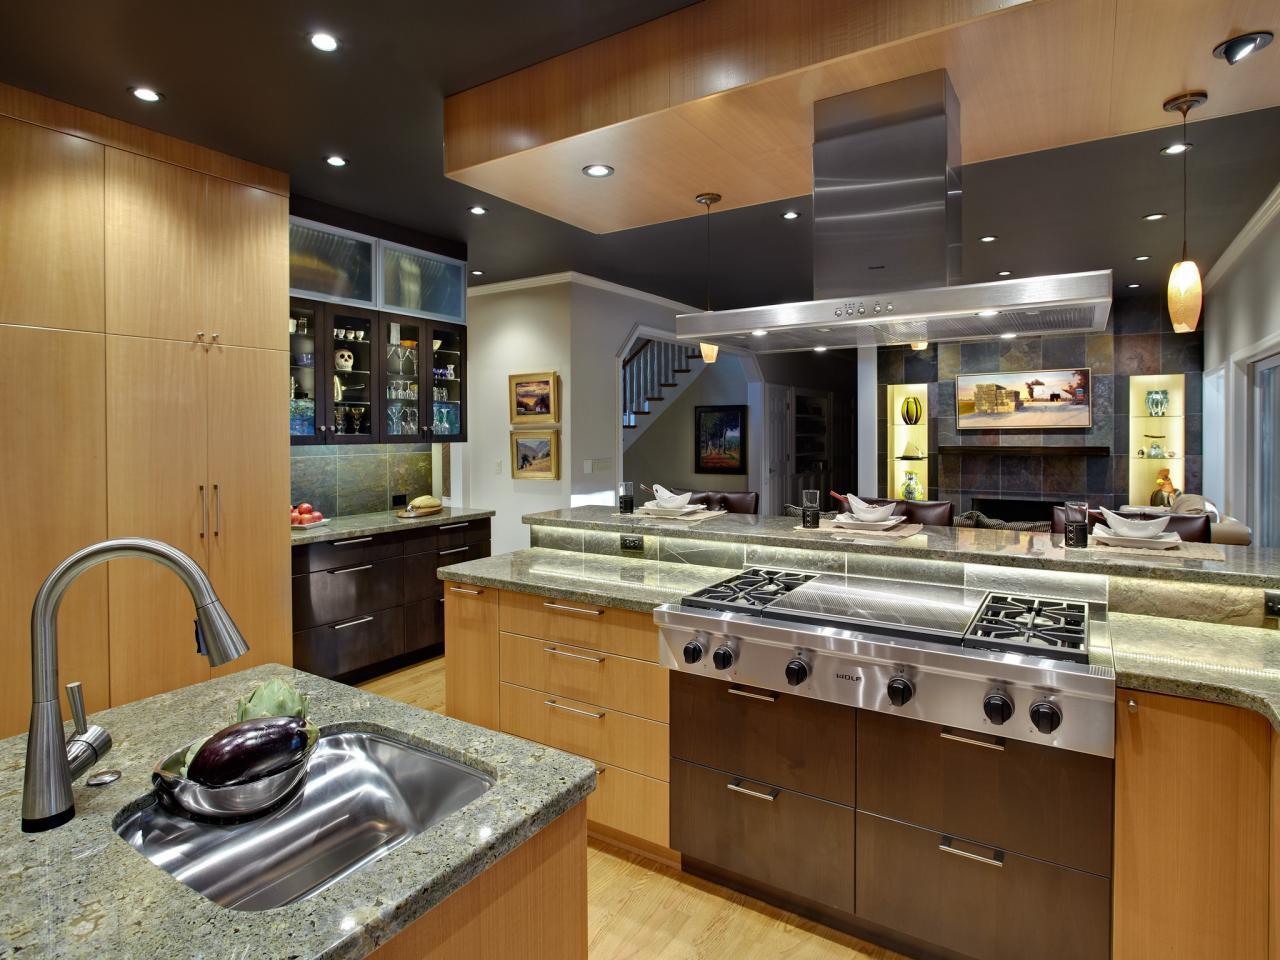 Drop Ceiling Accessories Modern Drop Ceiling Ideas For Kitchen - Modern kitchen ceiling designs